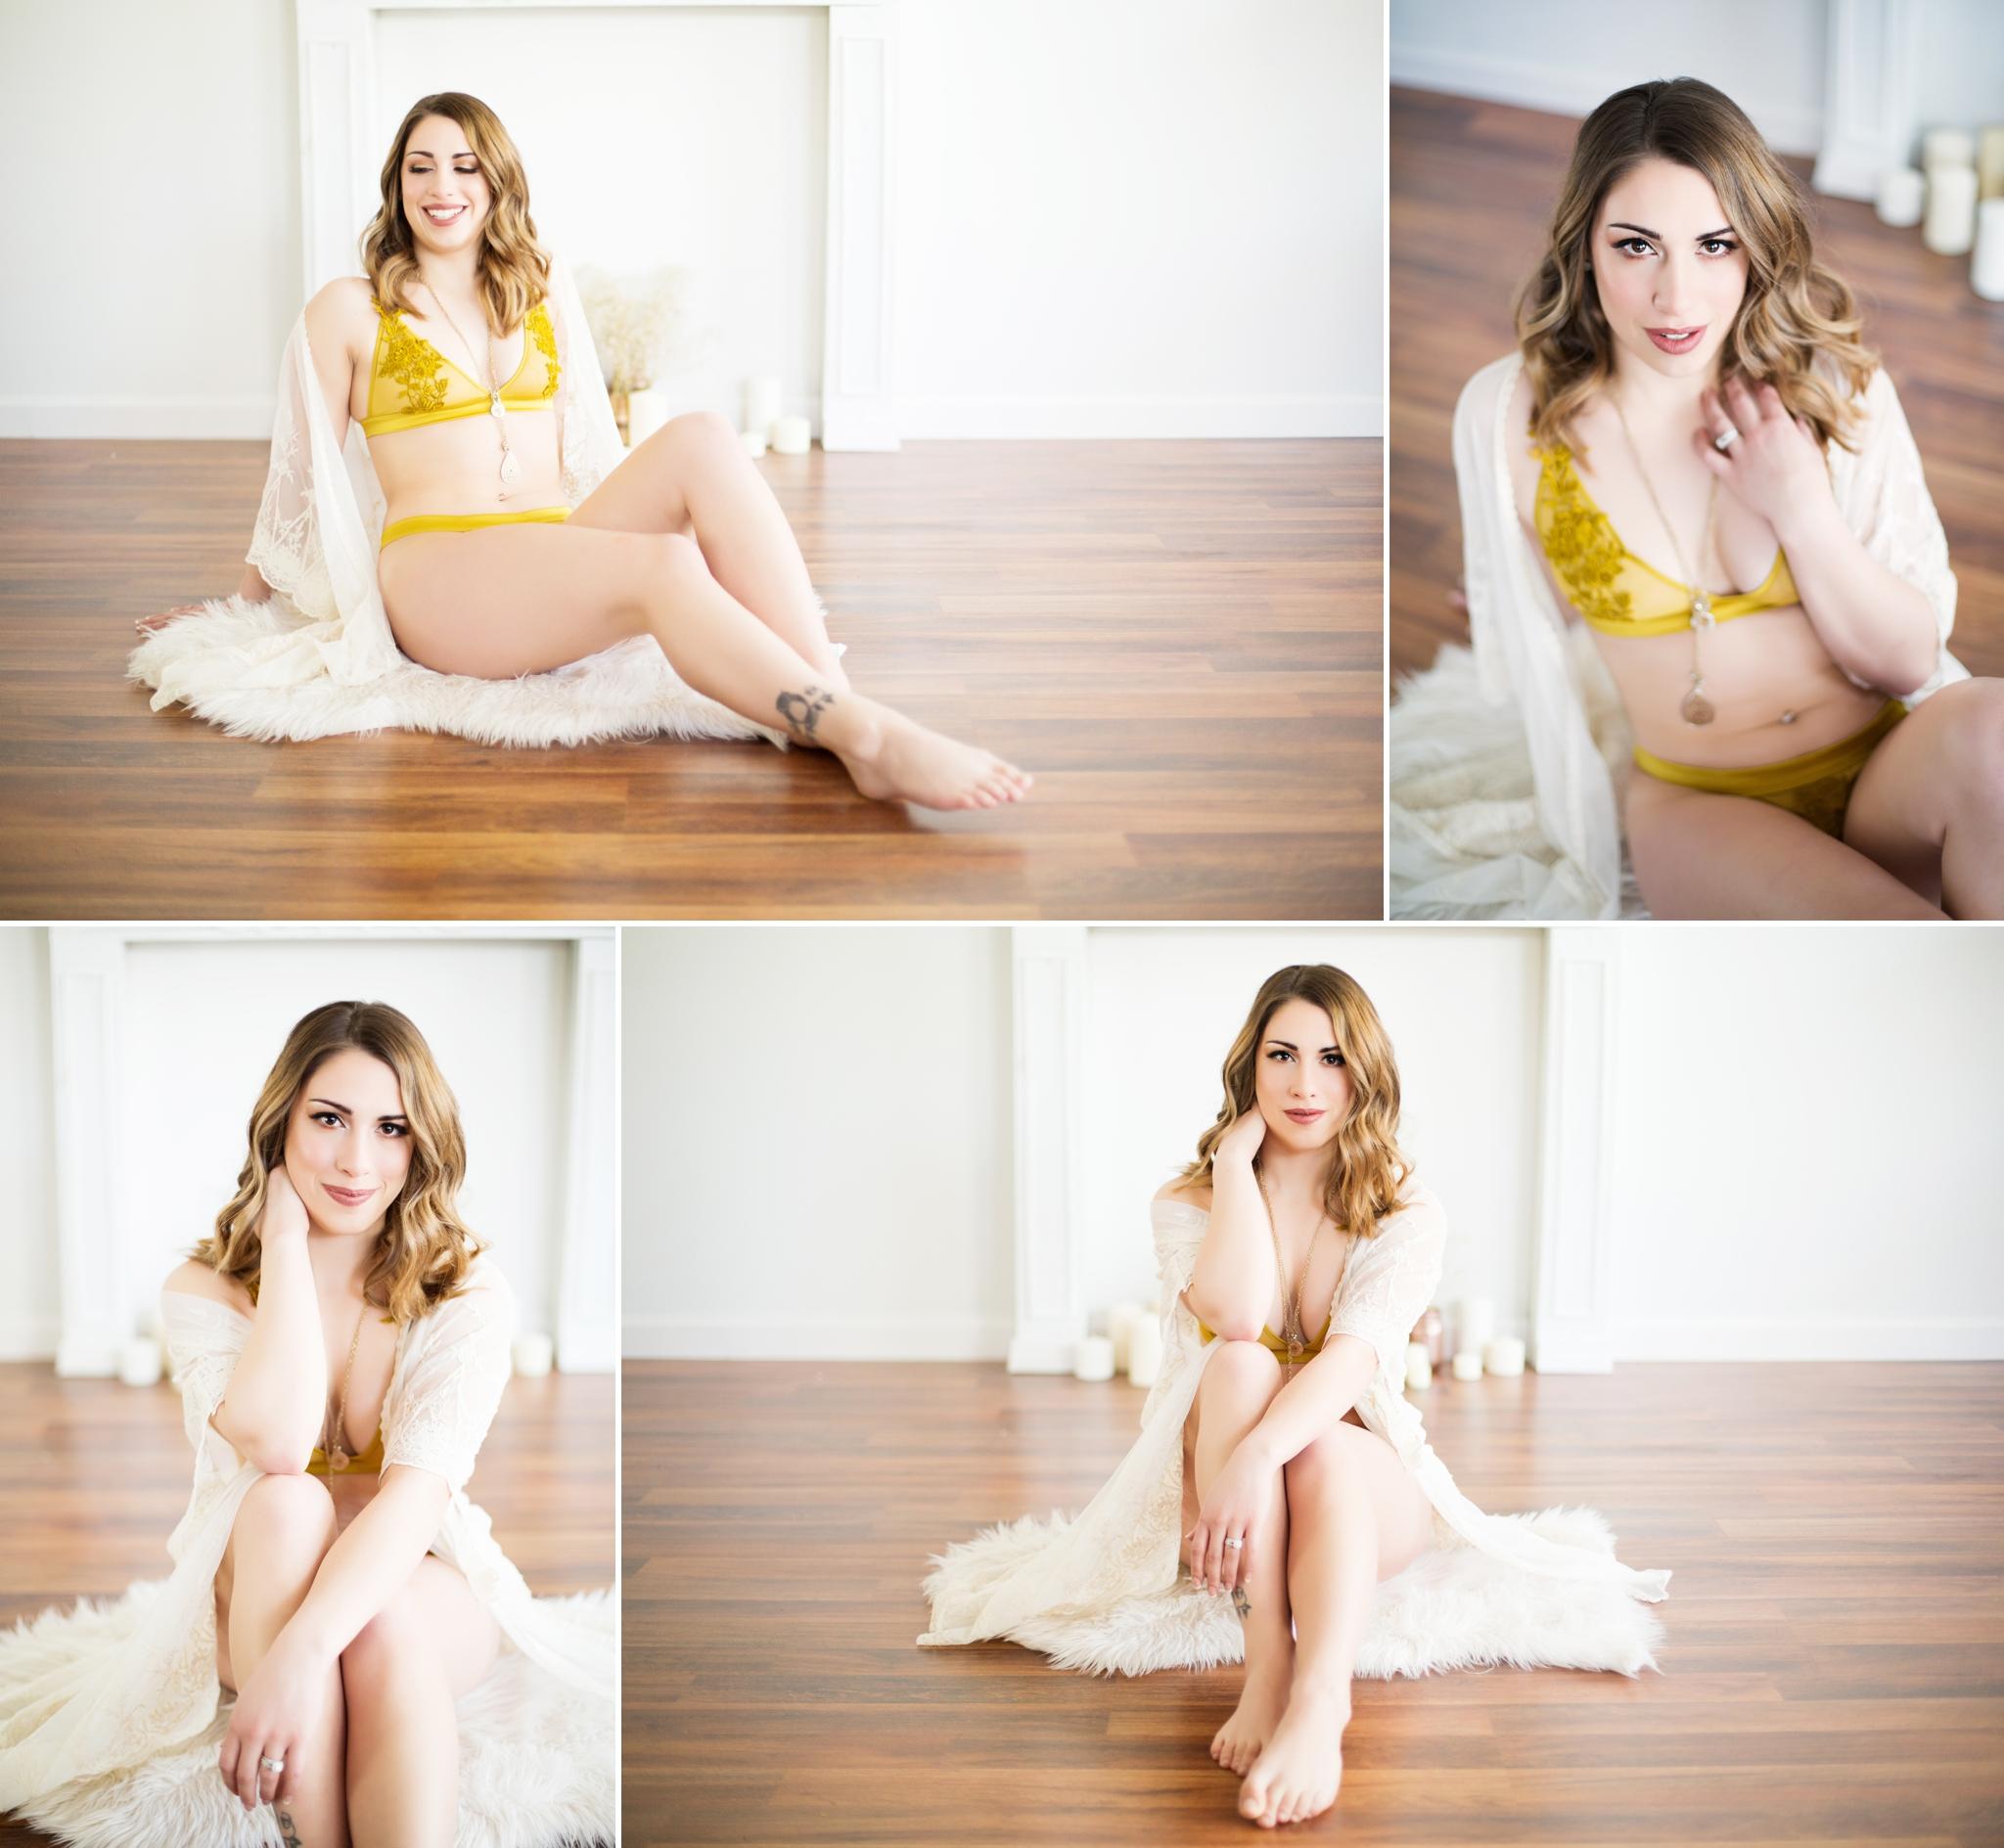 Sasha-Brown-2.jpg